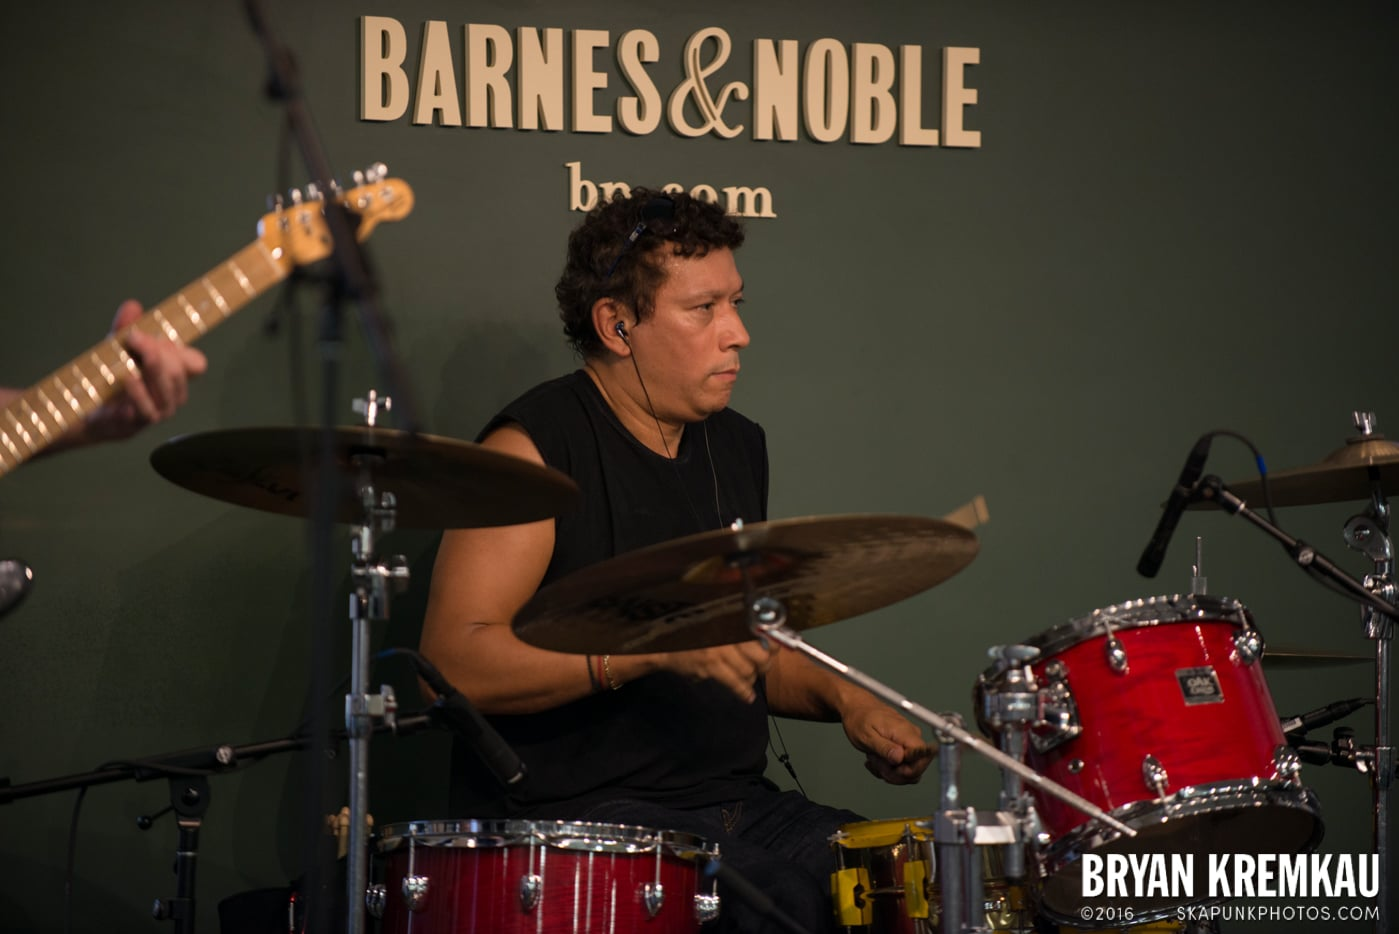 Willie Nile @ Barnes & Noble: Union Square, NYC - 6.25.13 (6)